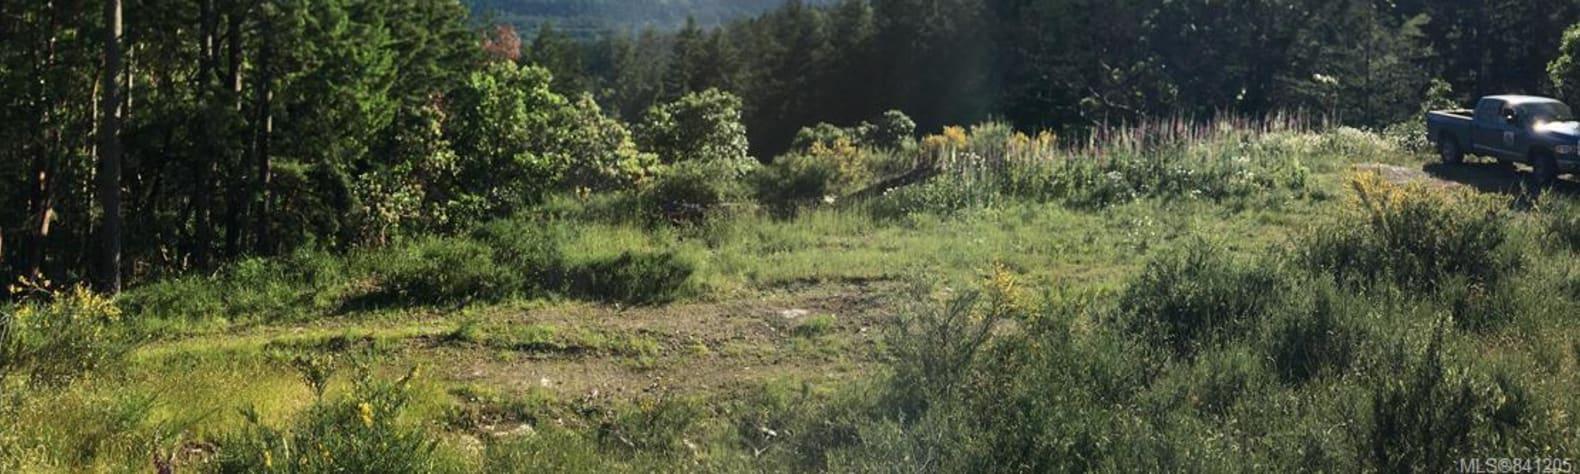 The Aviary Mountain-Top Vista